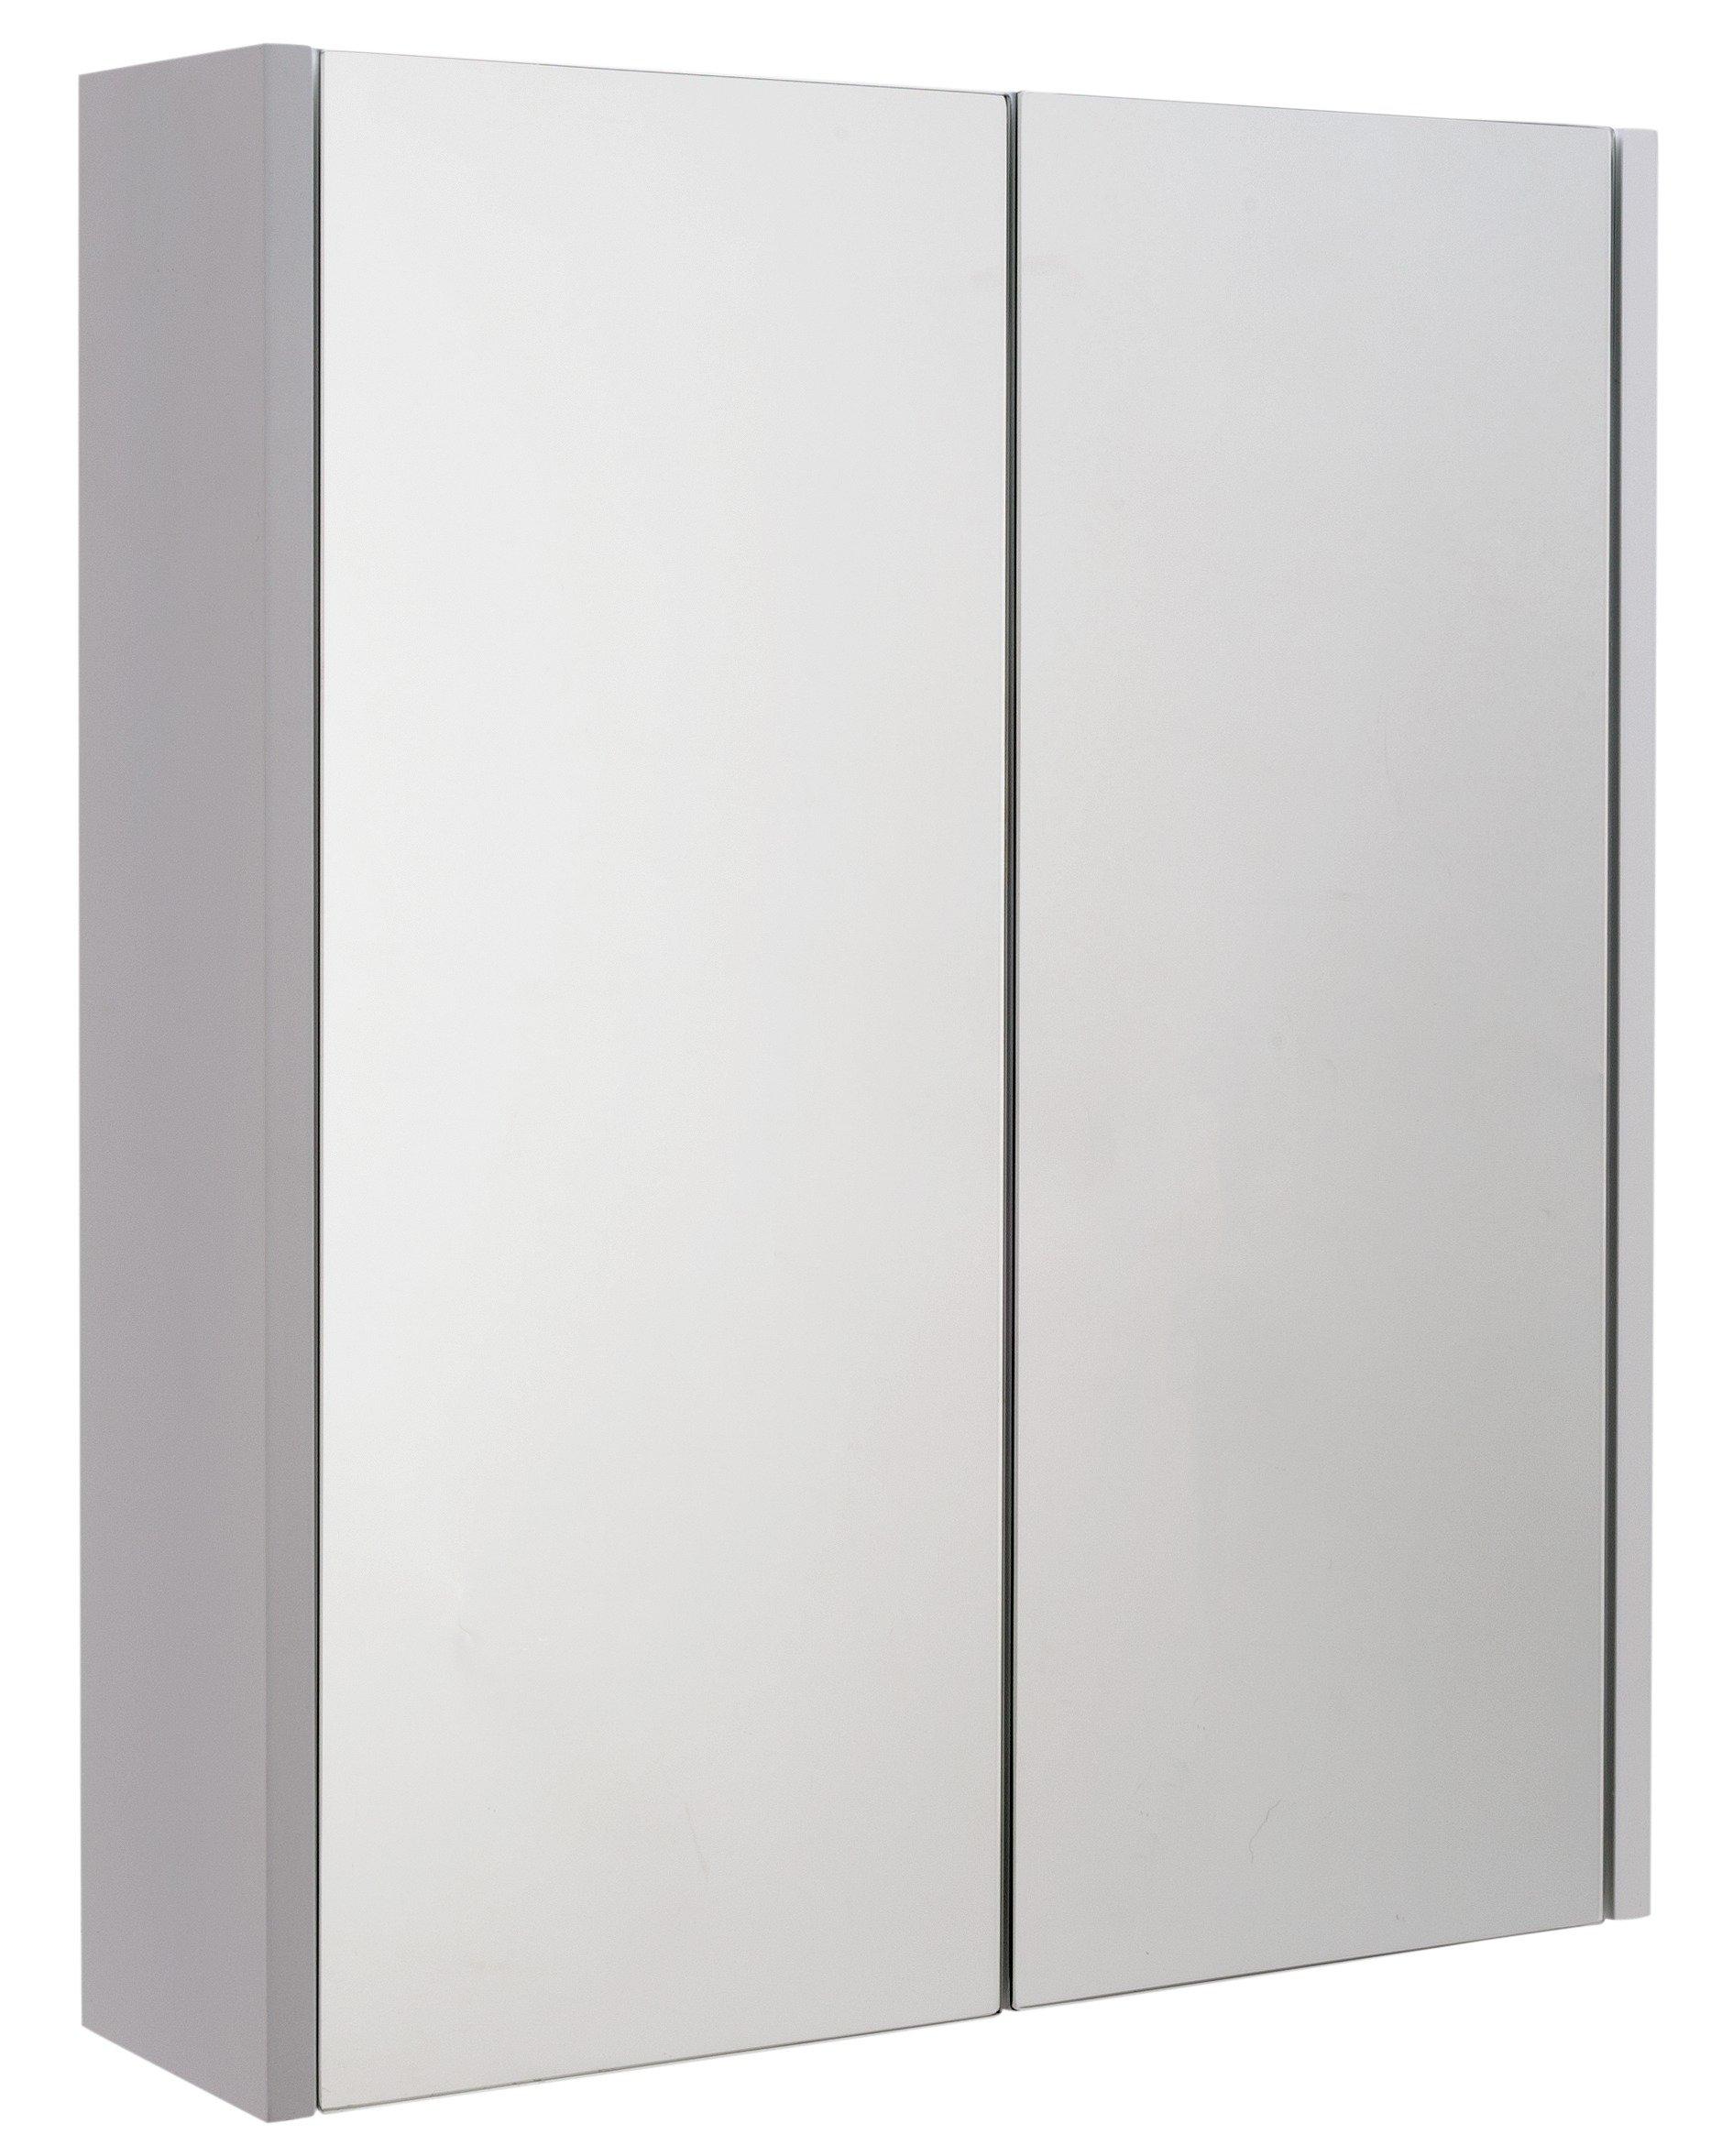 Black Bathroom Cabinet Bathroom Choosing The Design Of